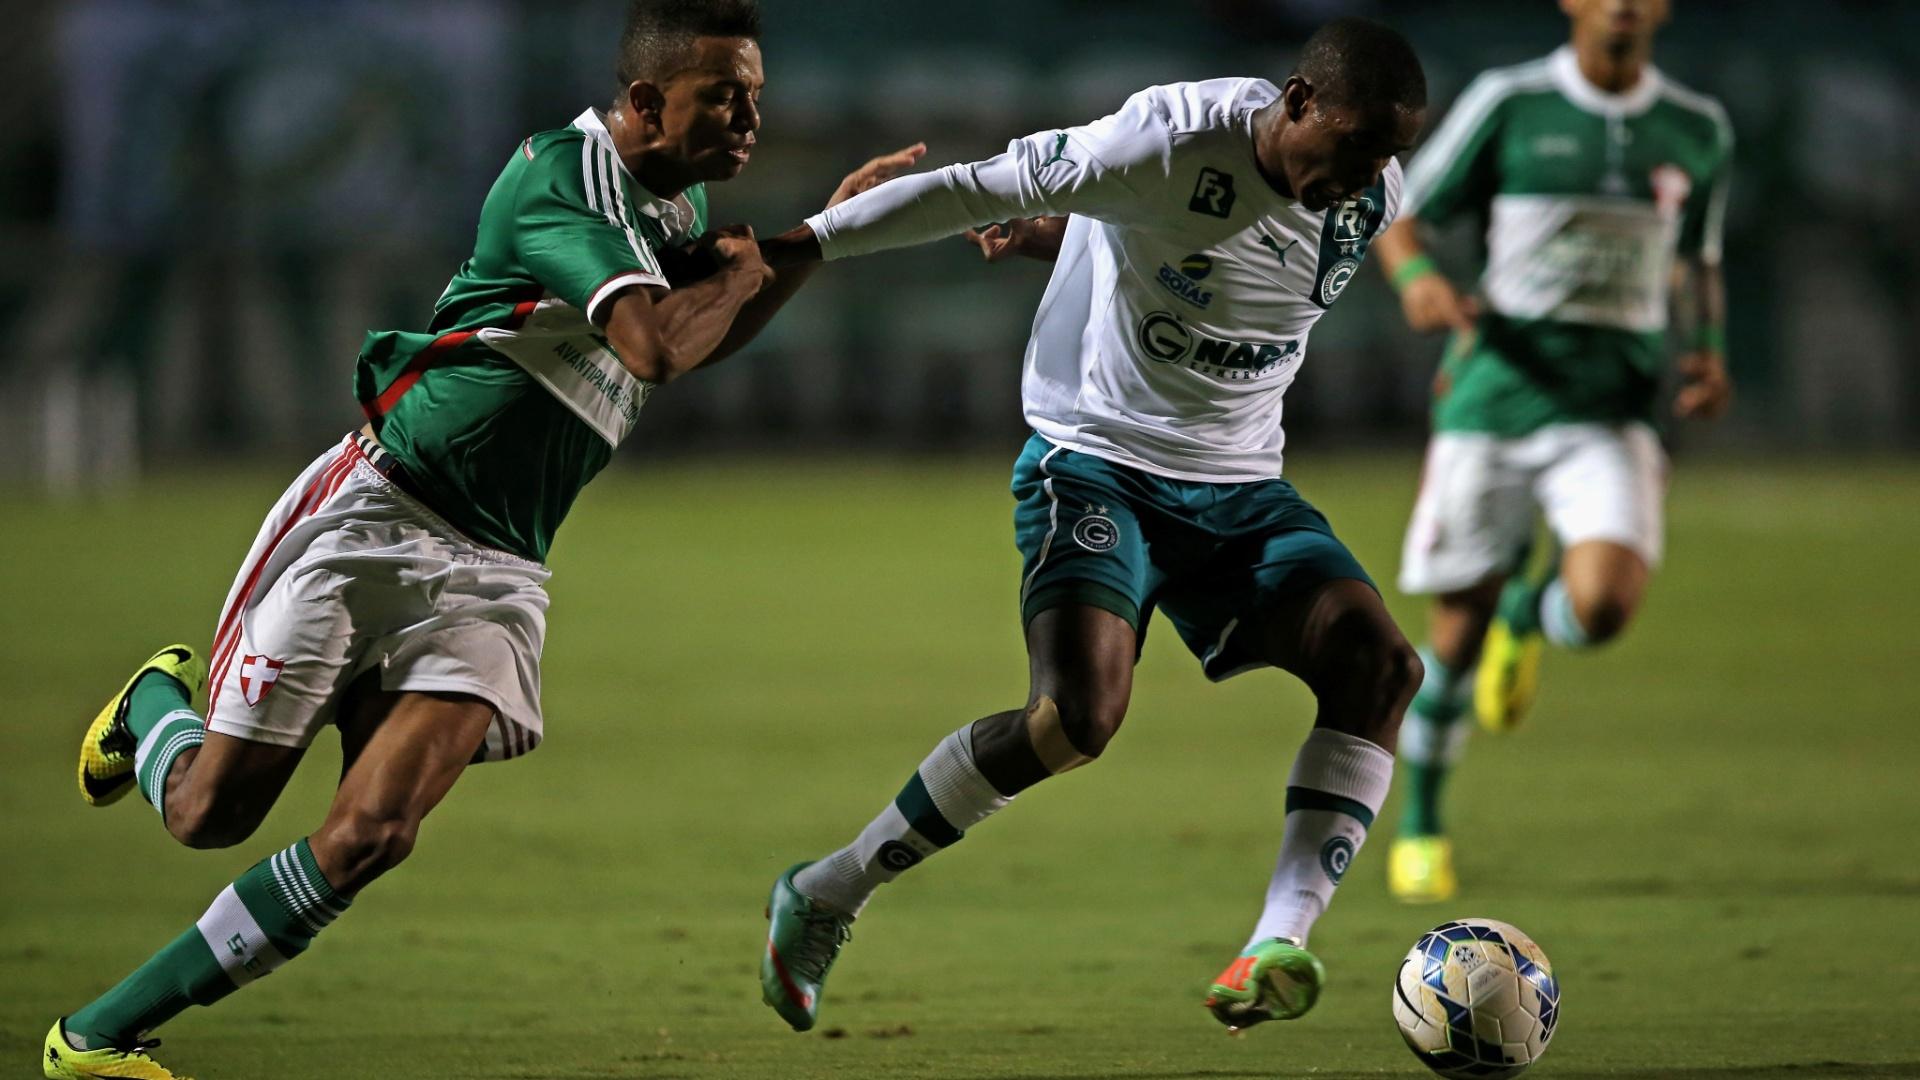 10.05.14 - Matheus tenta tirar a bola de Thiago Mendes, do Goiás, durante a vitória do Palmeiras